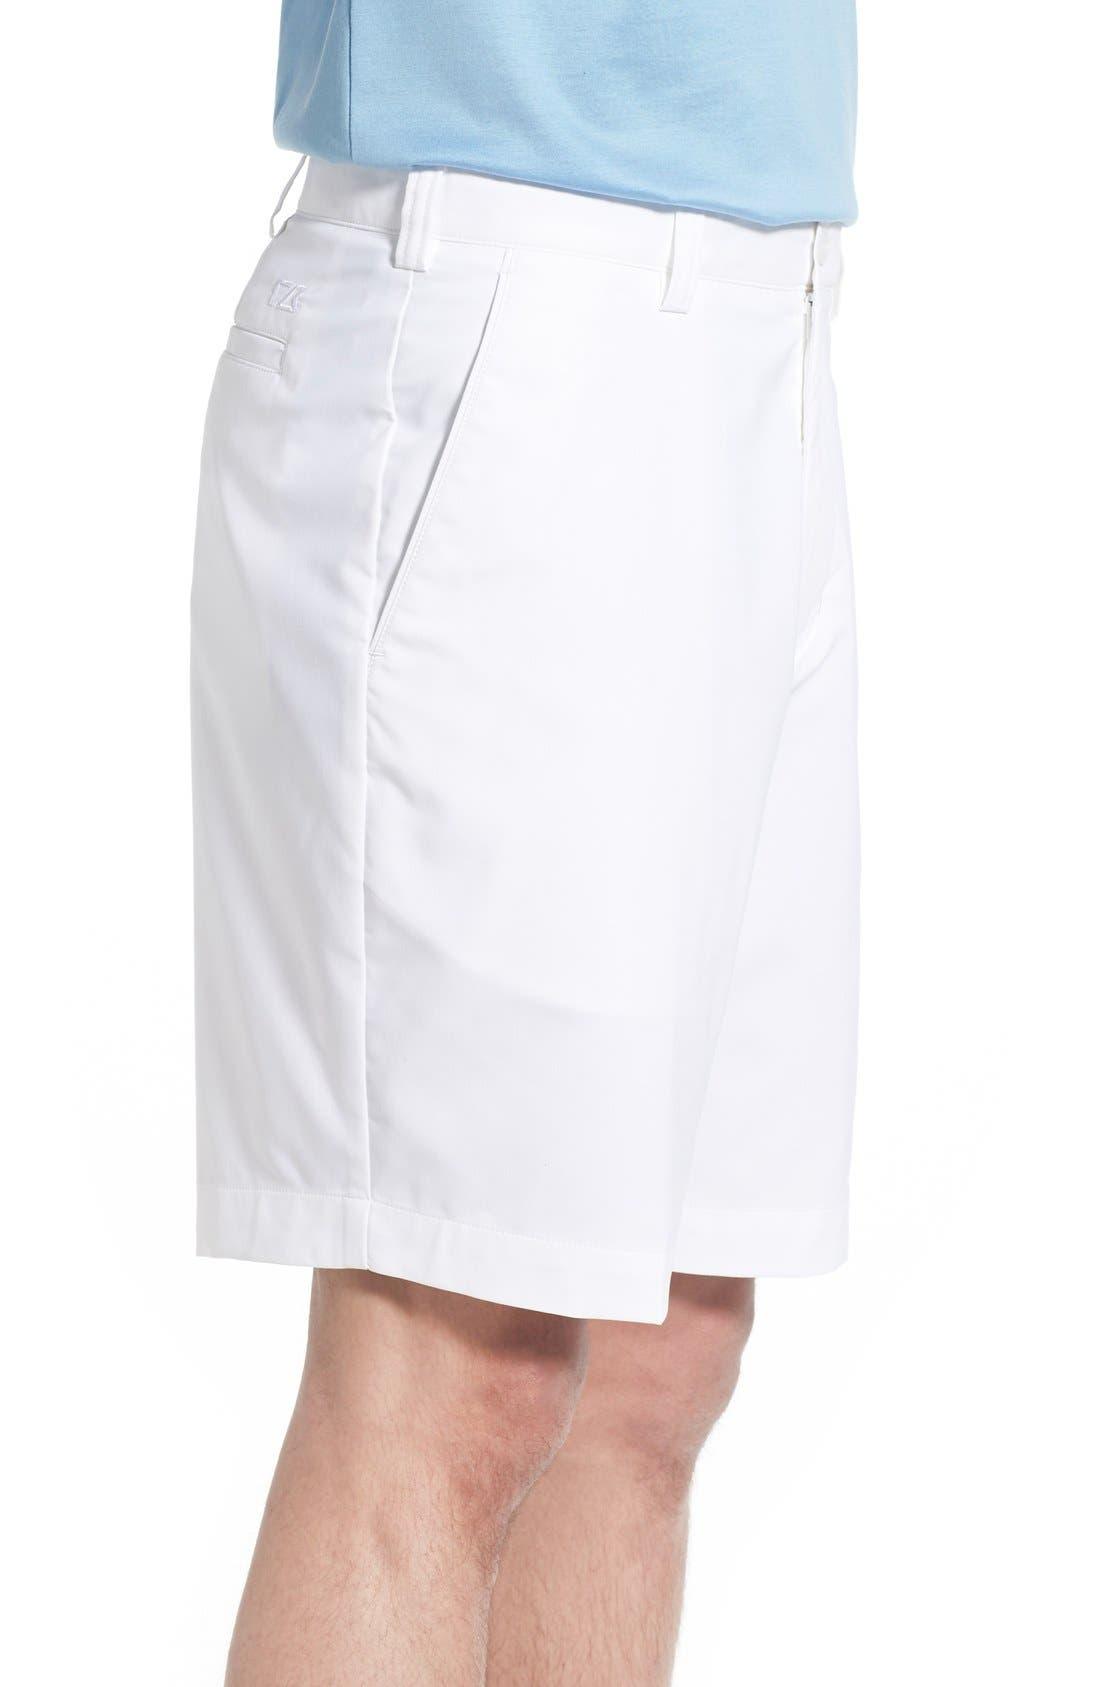 DryTec Shorts,                             Alternate thumbnail 4, color,                             WHITE